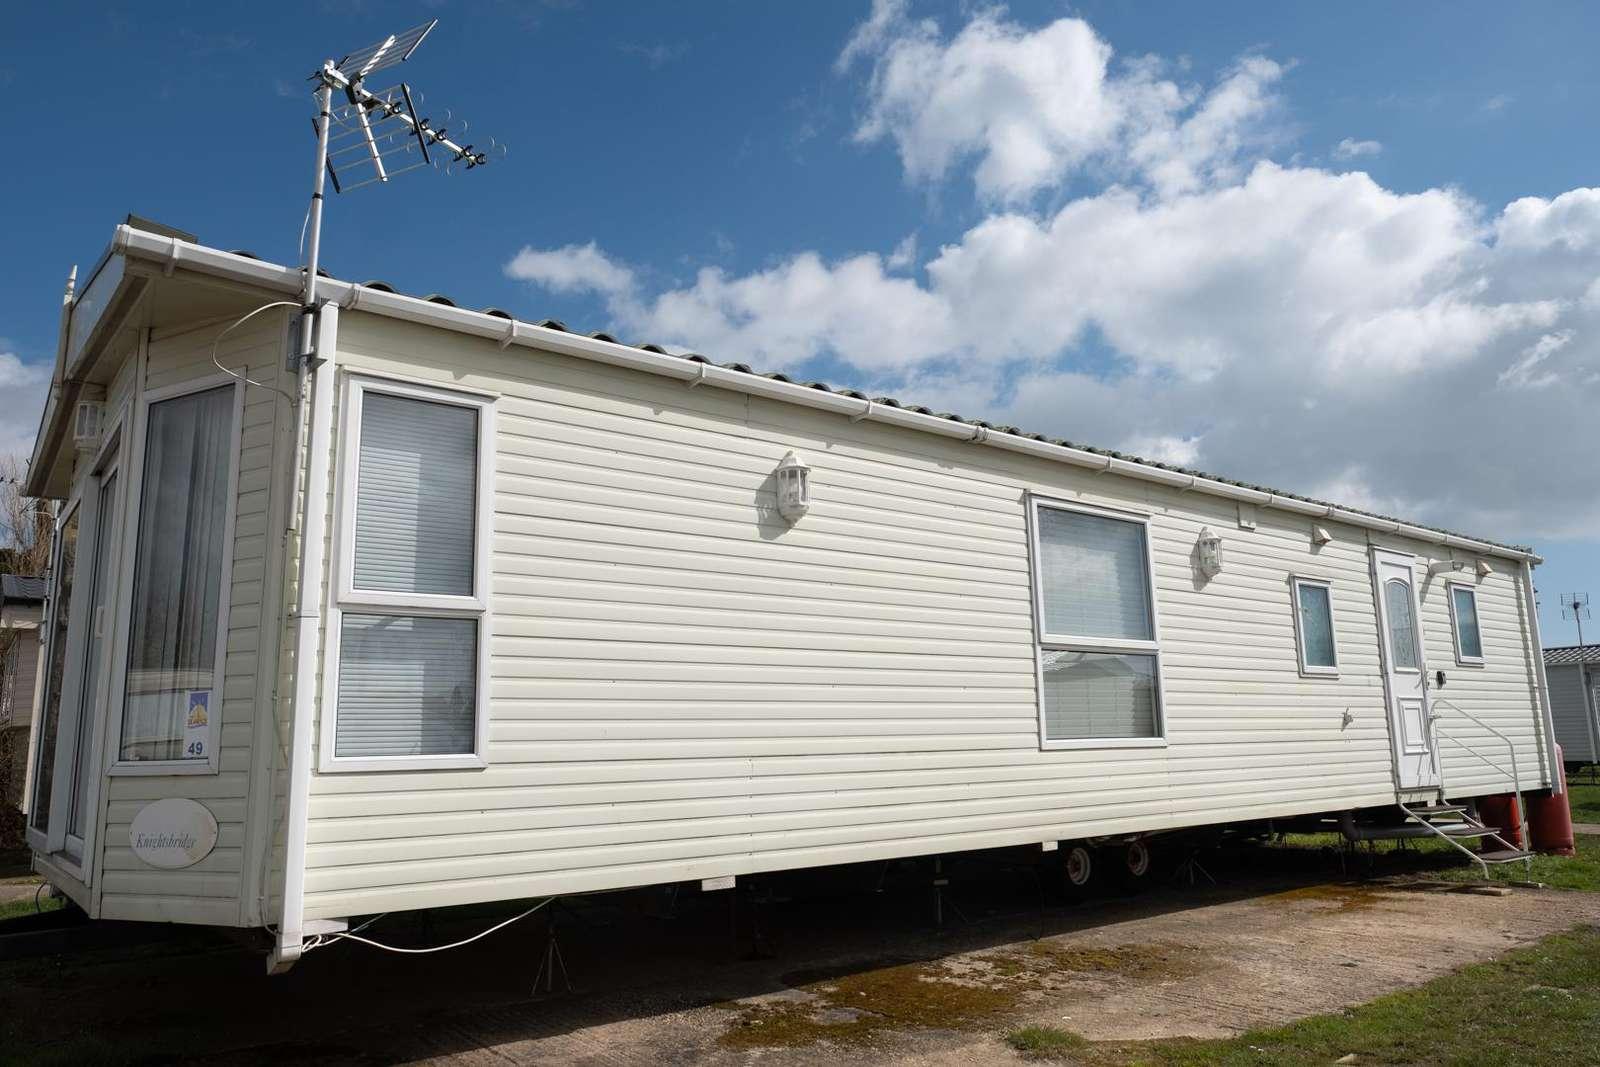 27049S – Seawick, 2 bed, 6 berth caravan with D/G & C/H. Diamond rated. - property